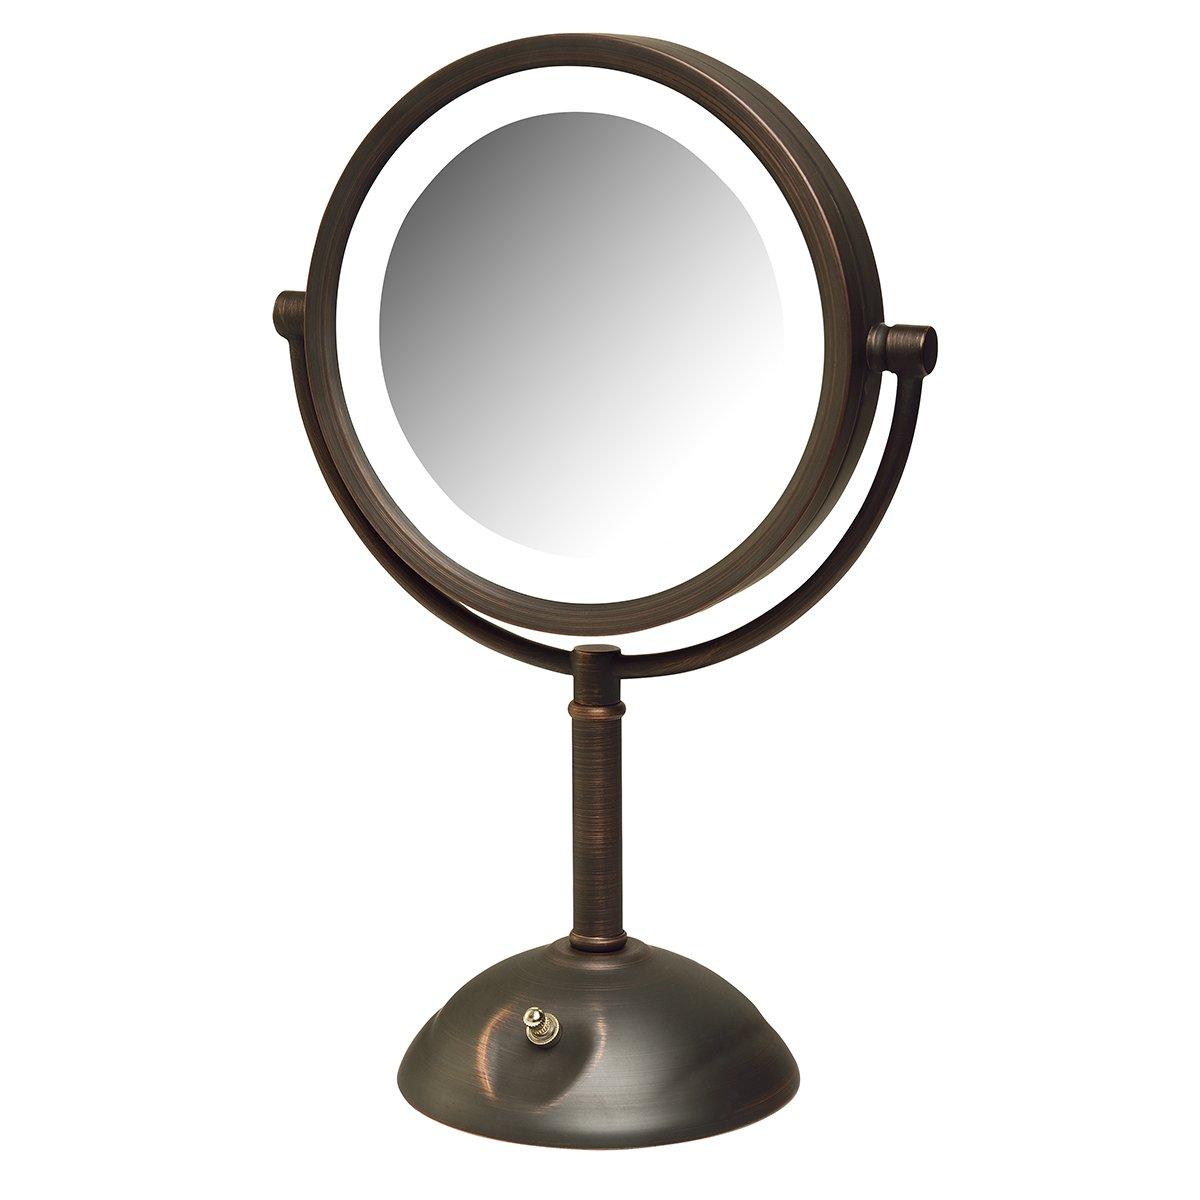 Jerdon HL8808BZL 8X Magnification LED Lighted Table Top Mirror, Bronze by Jerdon